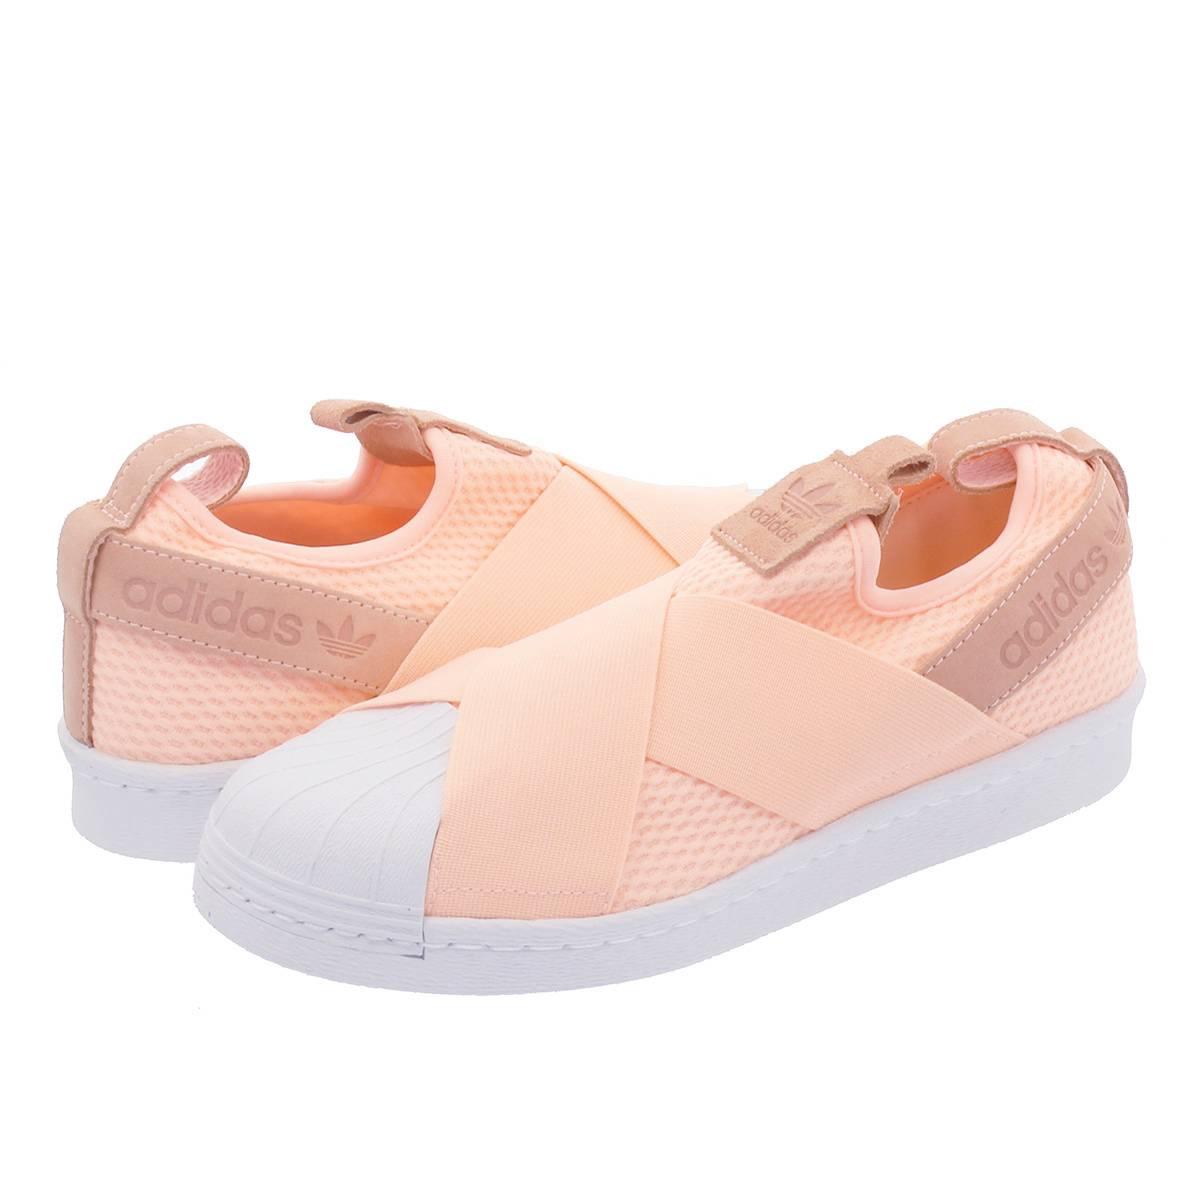 2bfde548c53 adidas SS Slip On W Adidas superstar slip-ons women CLEAR ORANGE RUNNING  WHITE